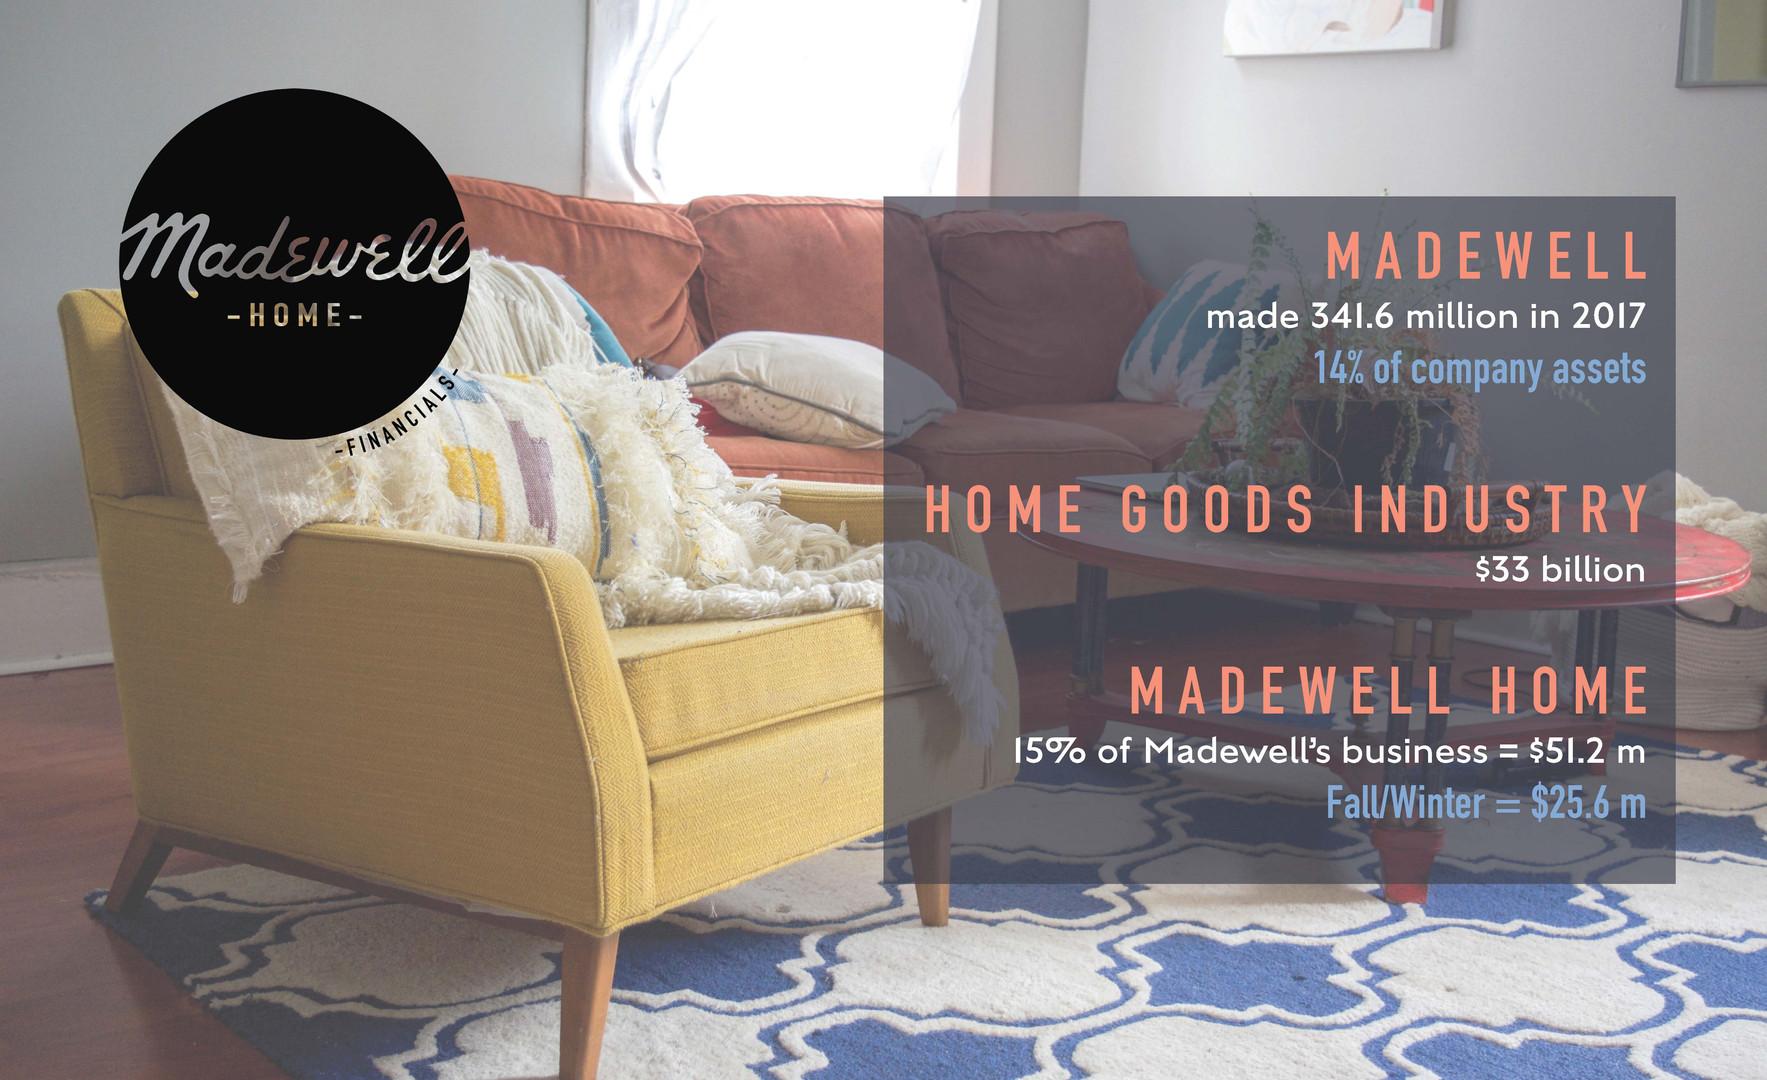 MadewellHomepresentation_Page_19.jpg